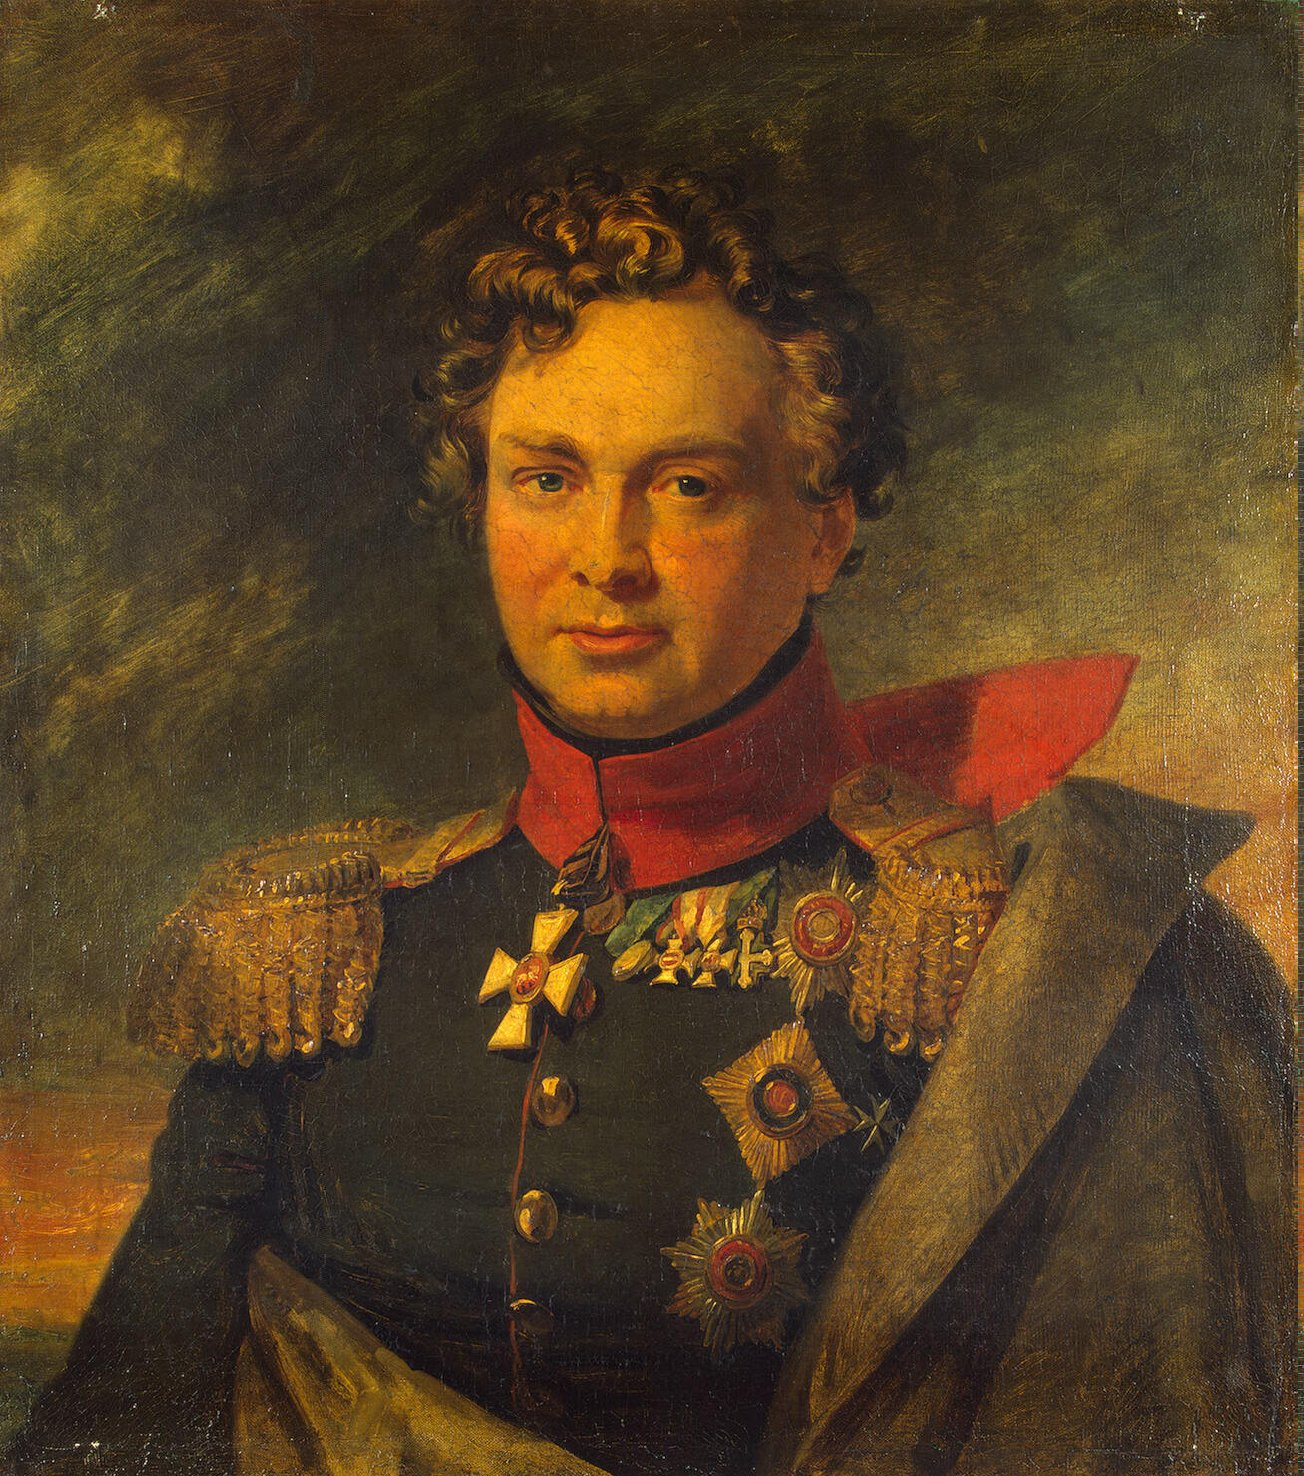 Горчаков, Андрей Иванович